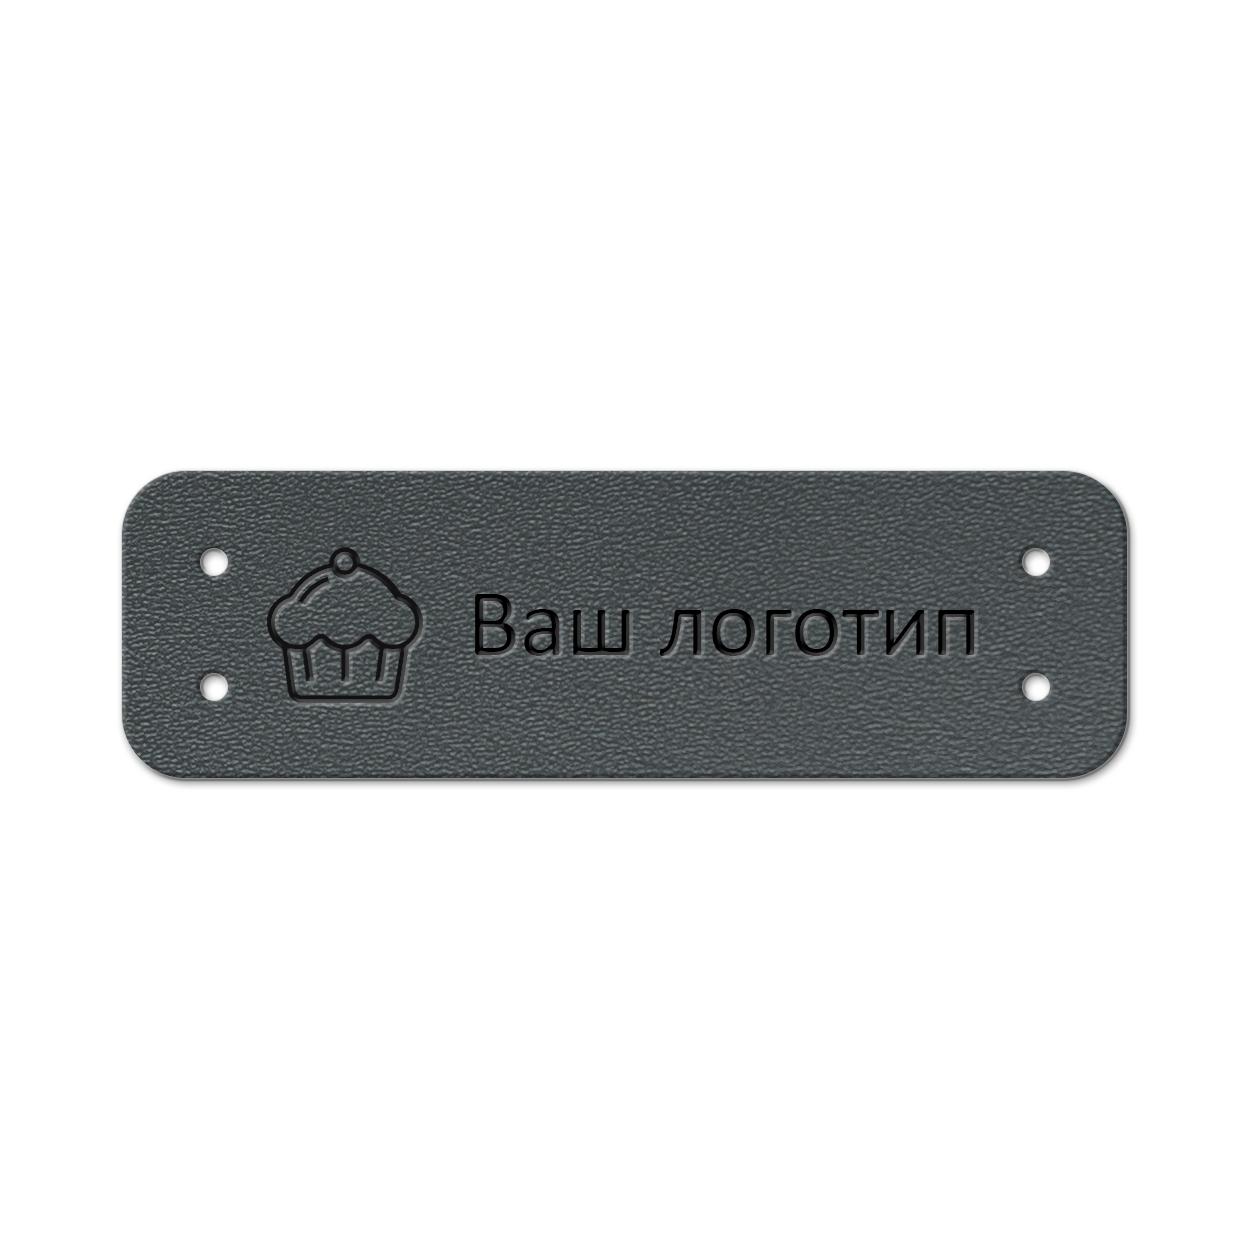 Бирка пришивная 1,2 х 4 cм. 10 шт. Silver